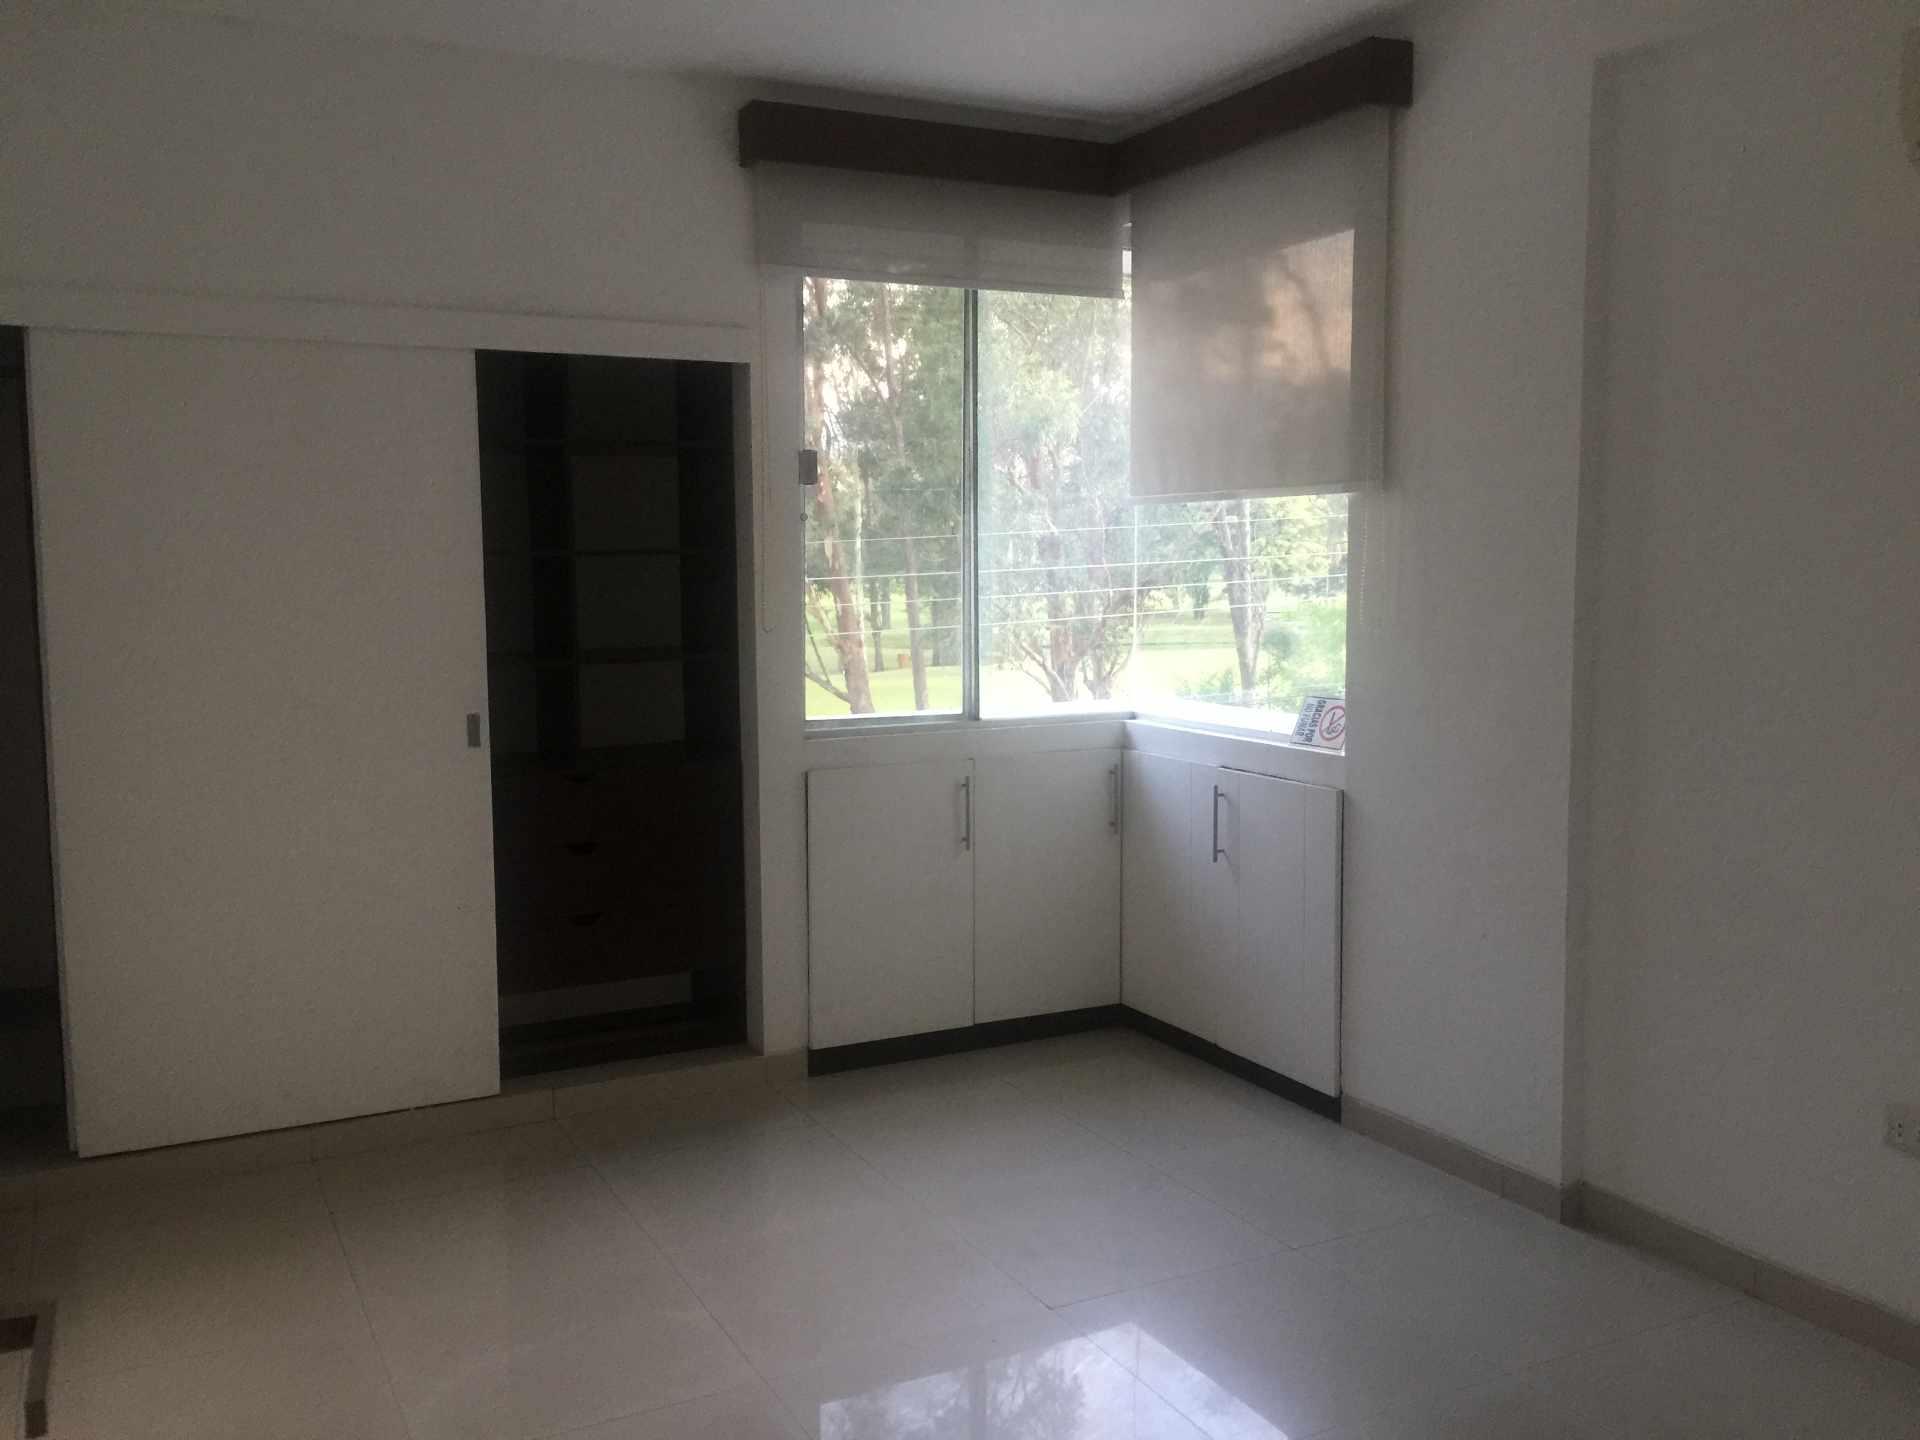 Departamento en Alquiler Calle Yaguarú, Condominio Las Palmas Residence Foto 3